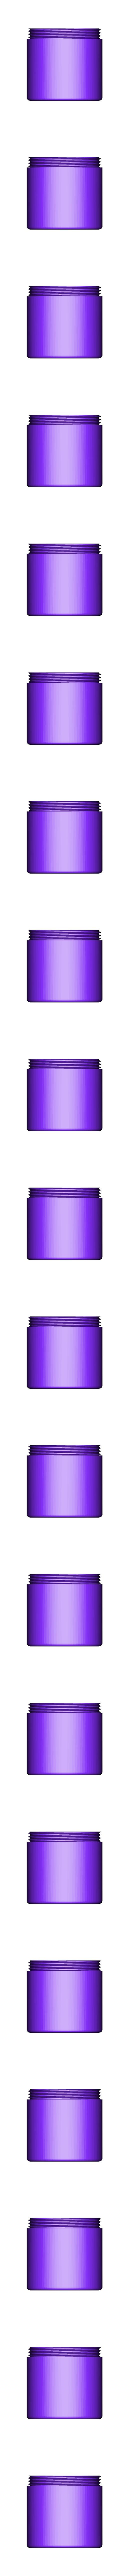 Blueprint_Carrier_Base.stl Download free STL file Blueprint Carrier • 3D printable template, DraftingJake